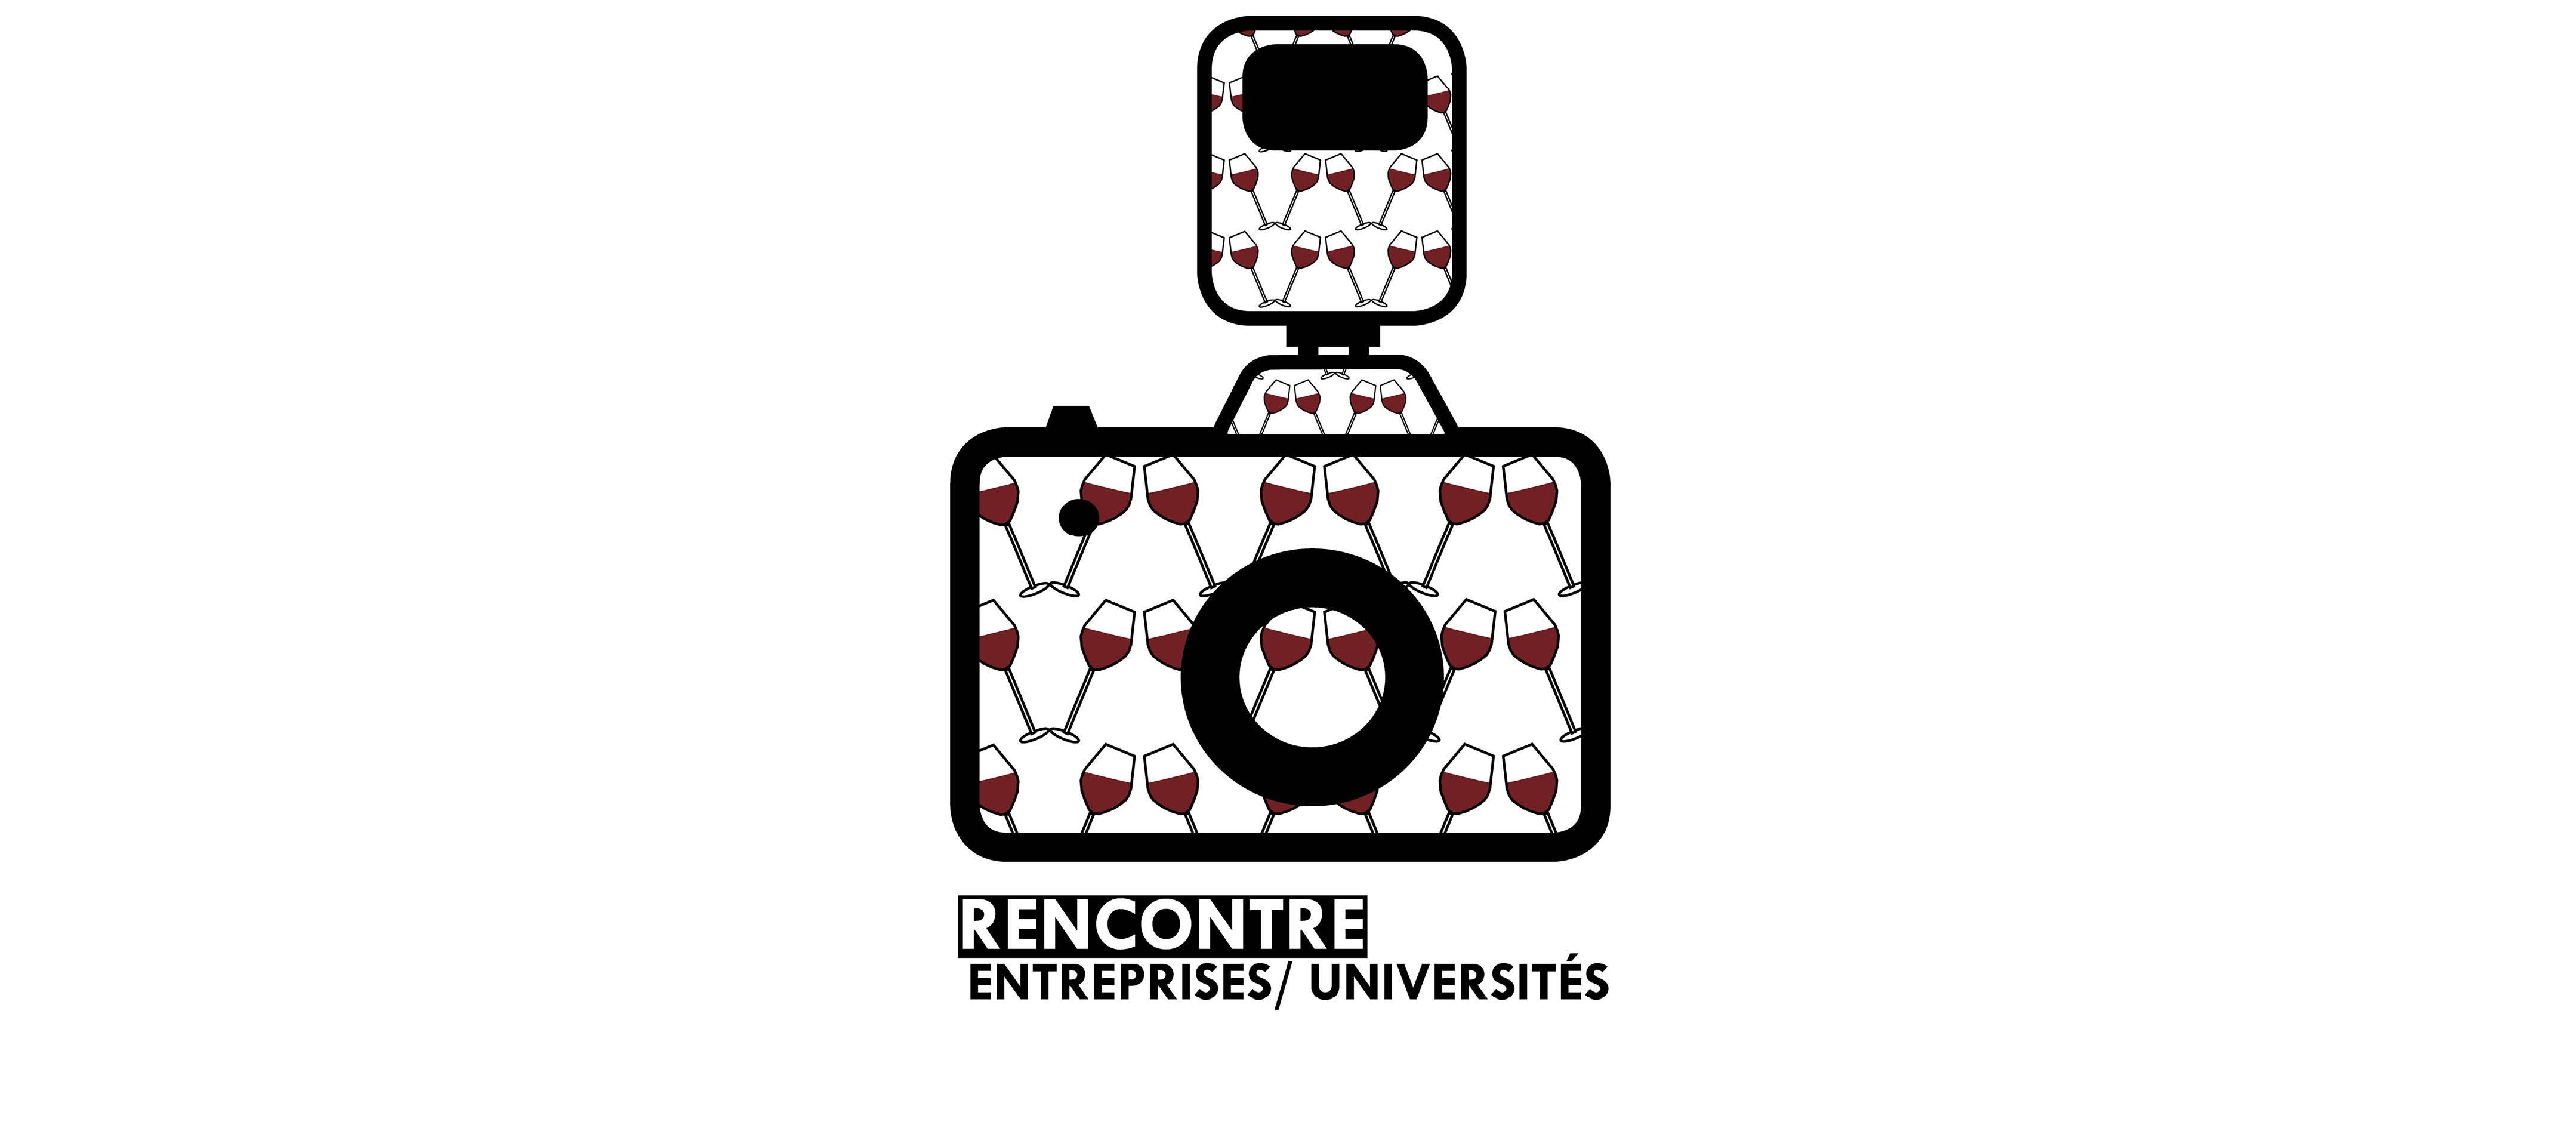 Rencontres universite entreprise 2018